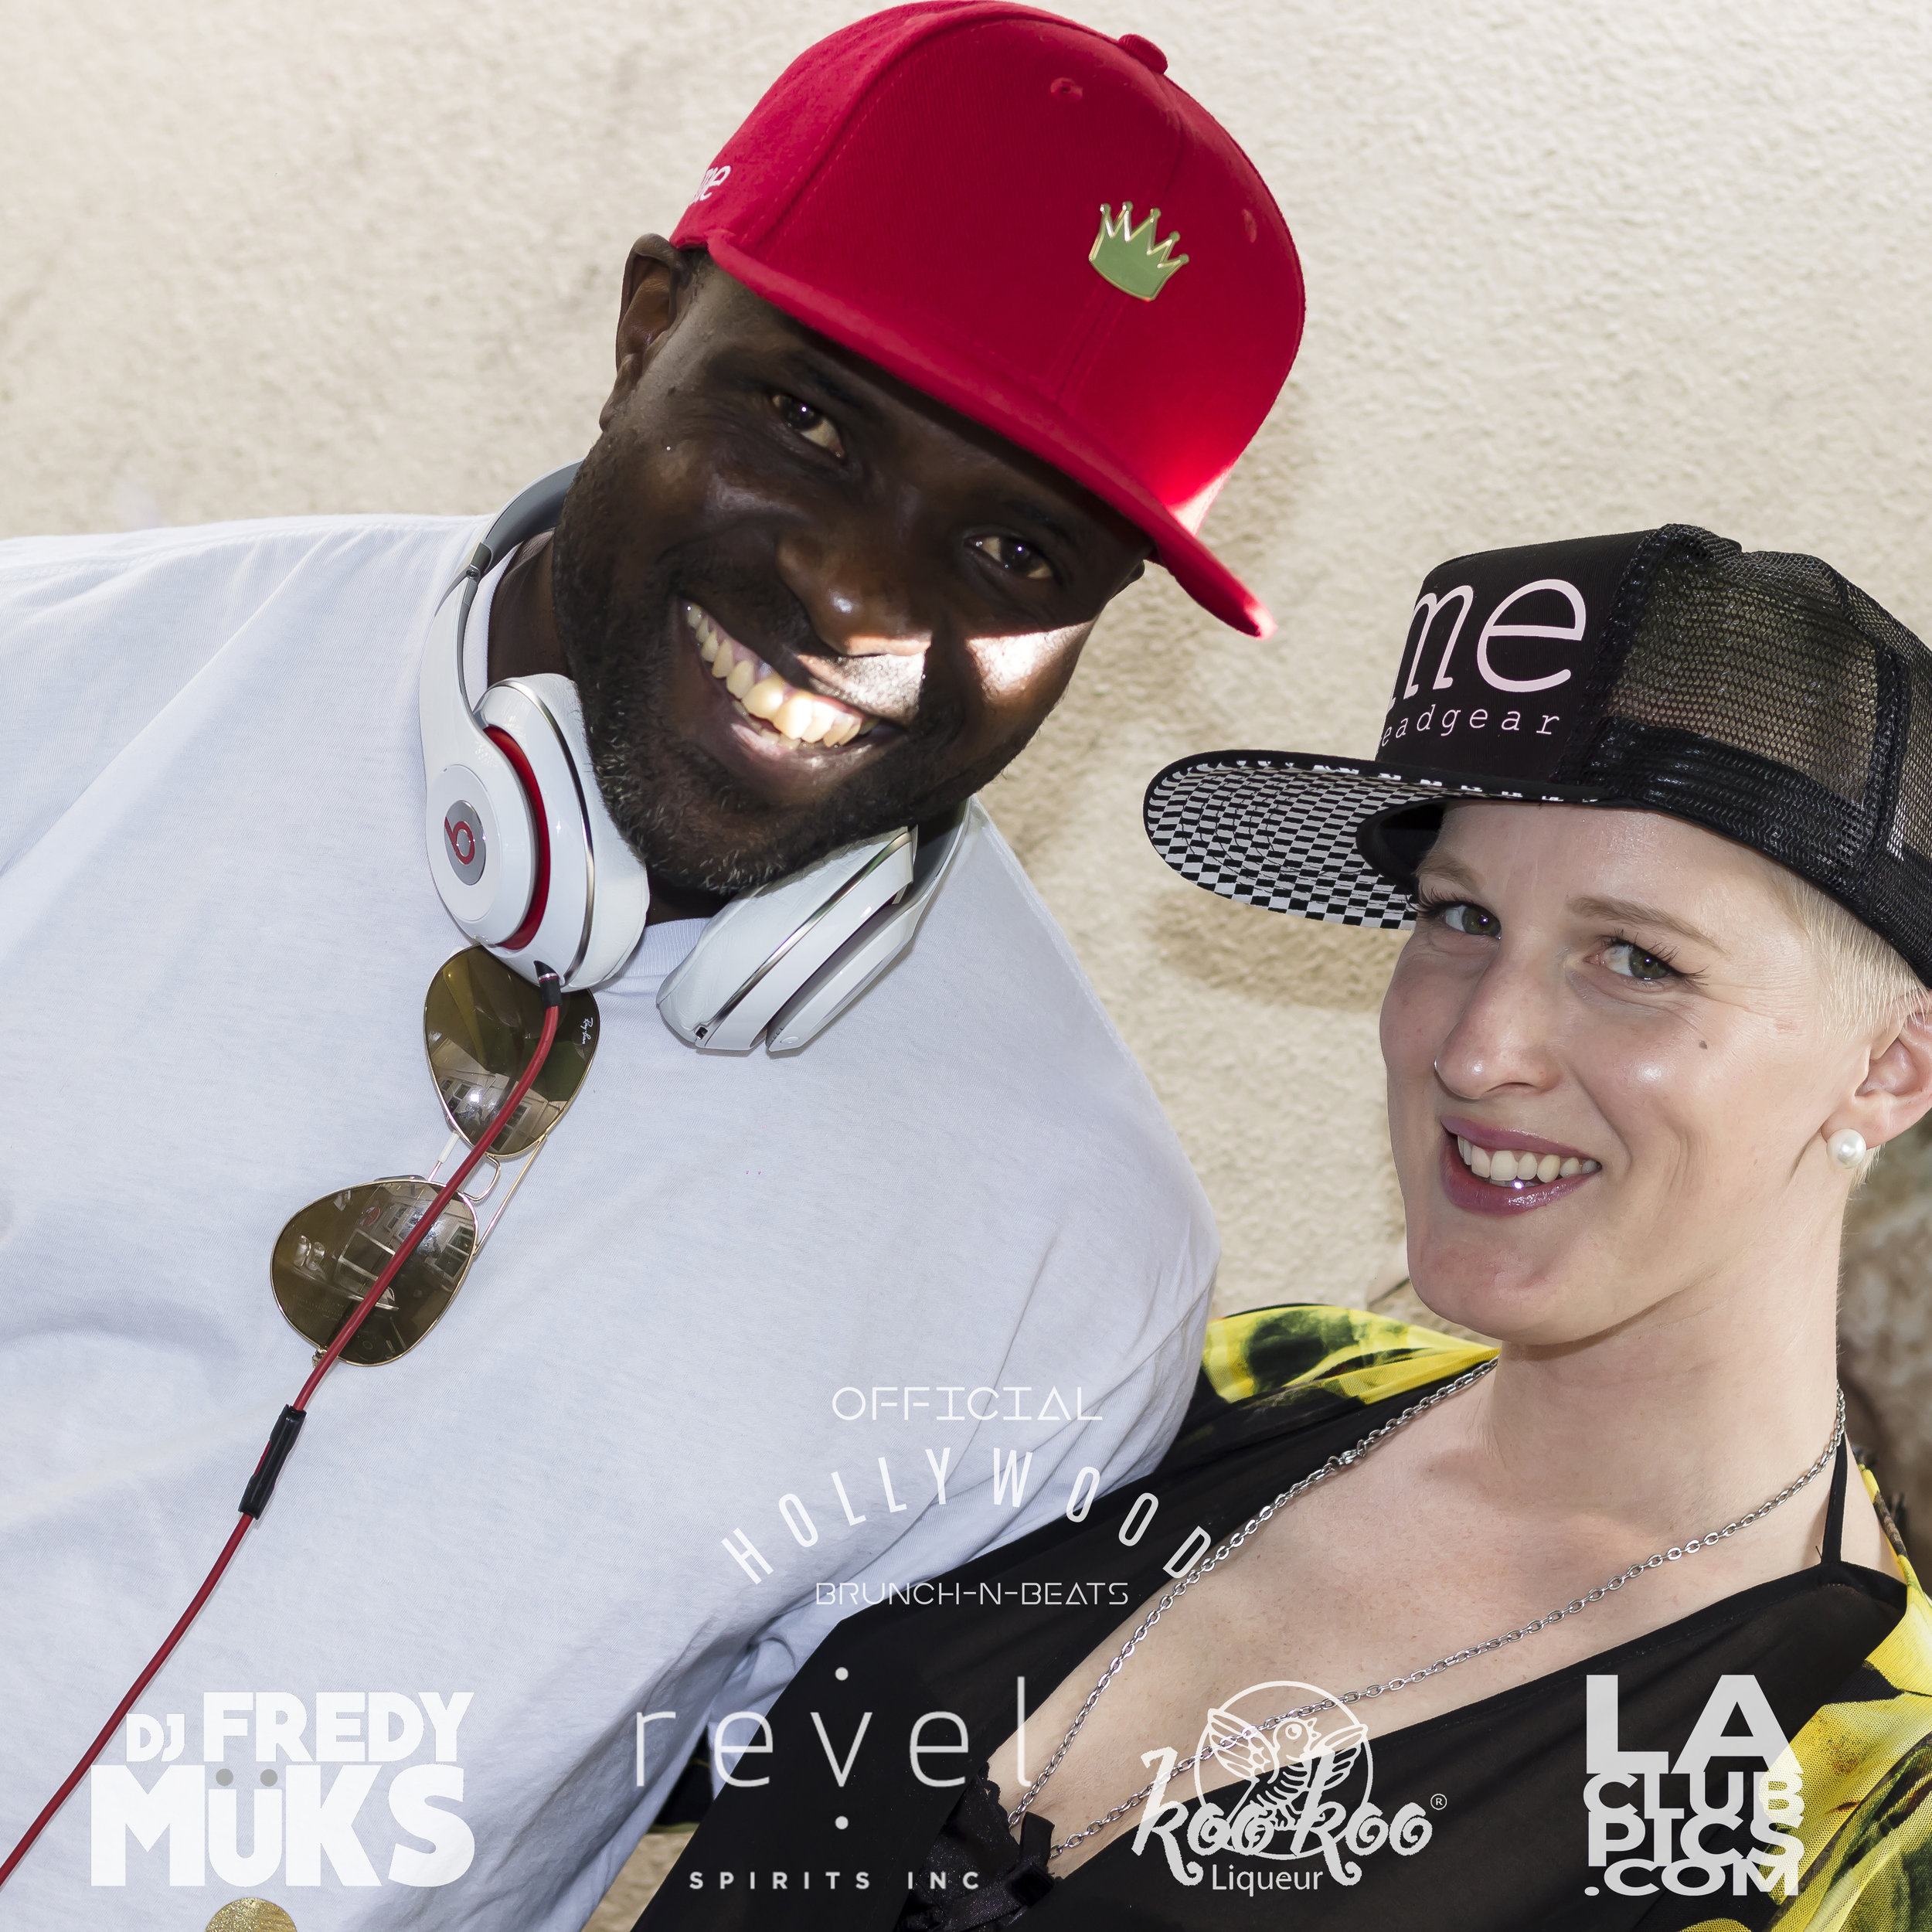 Hollywood Brunch-N-Beats - 03-18-18_74.jpg